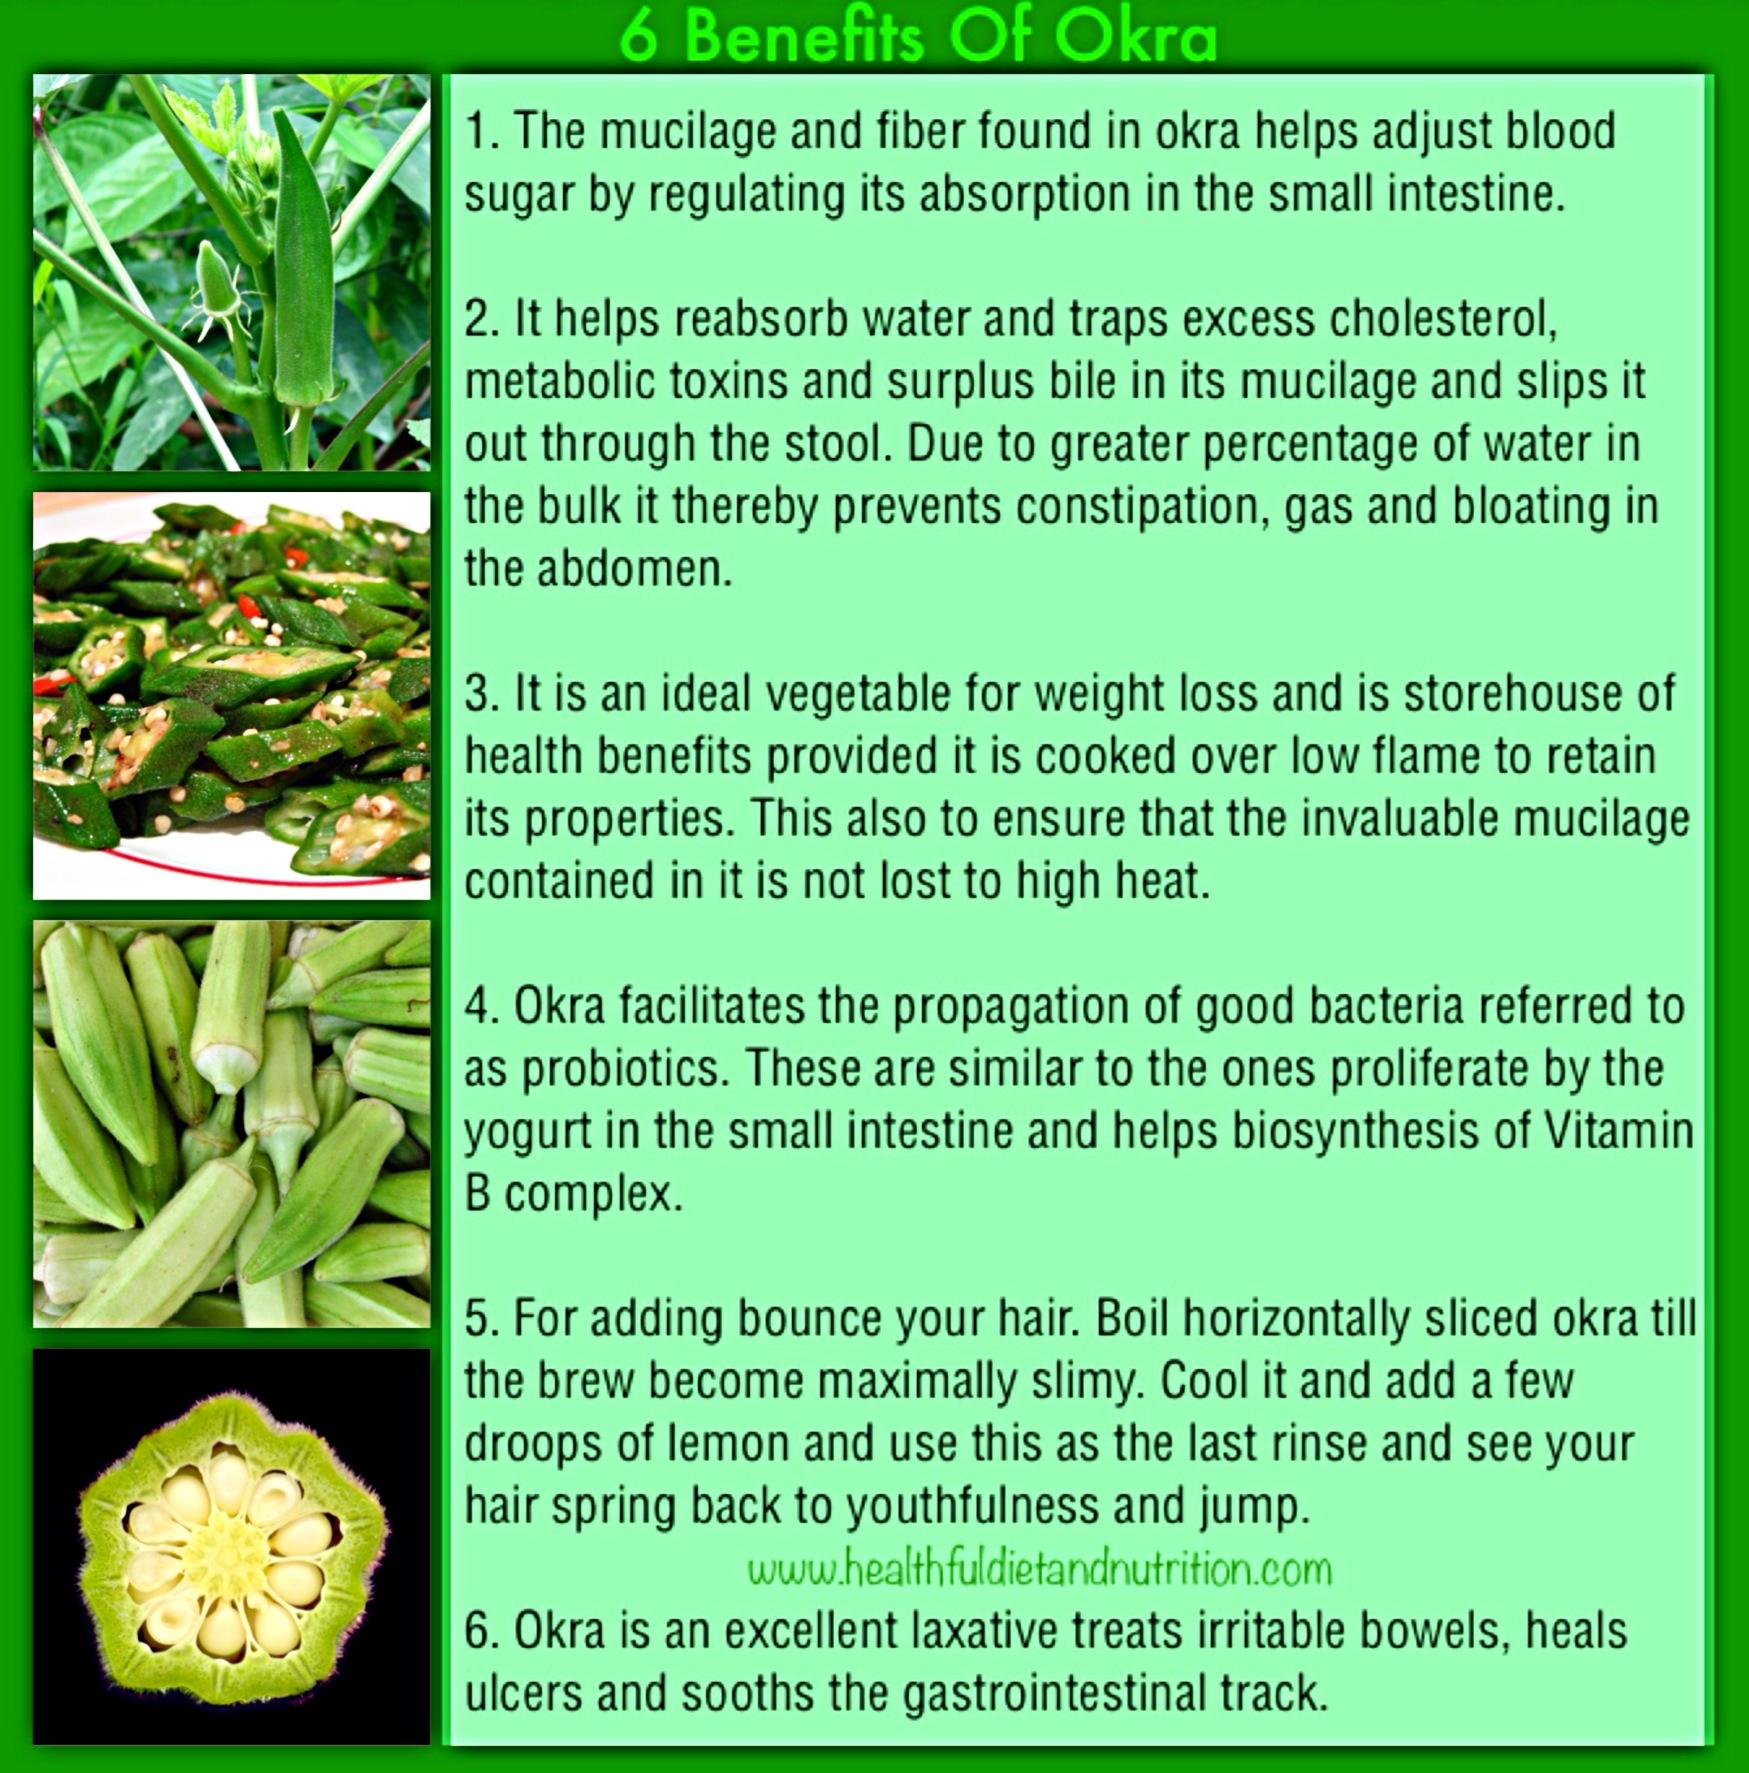 6 Health Benefits of Okra